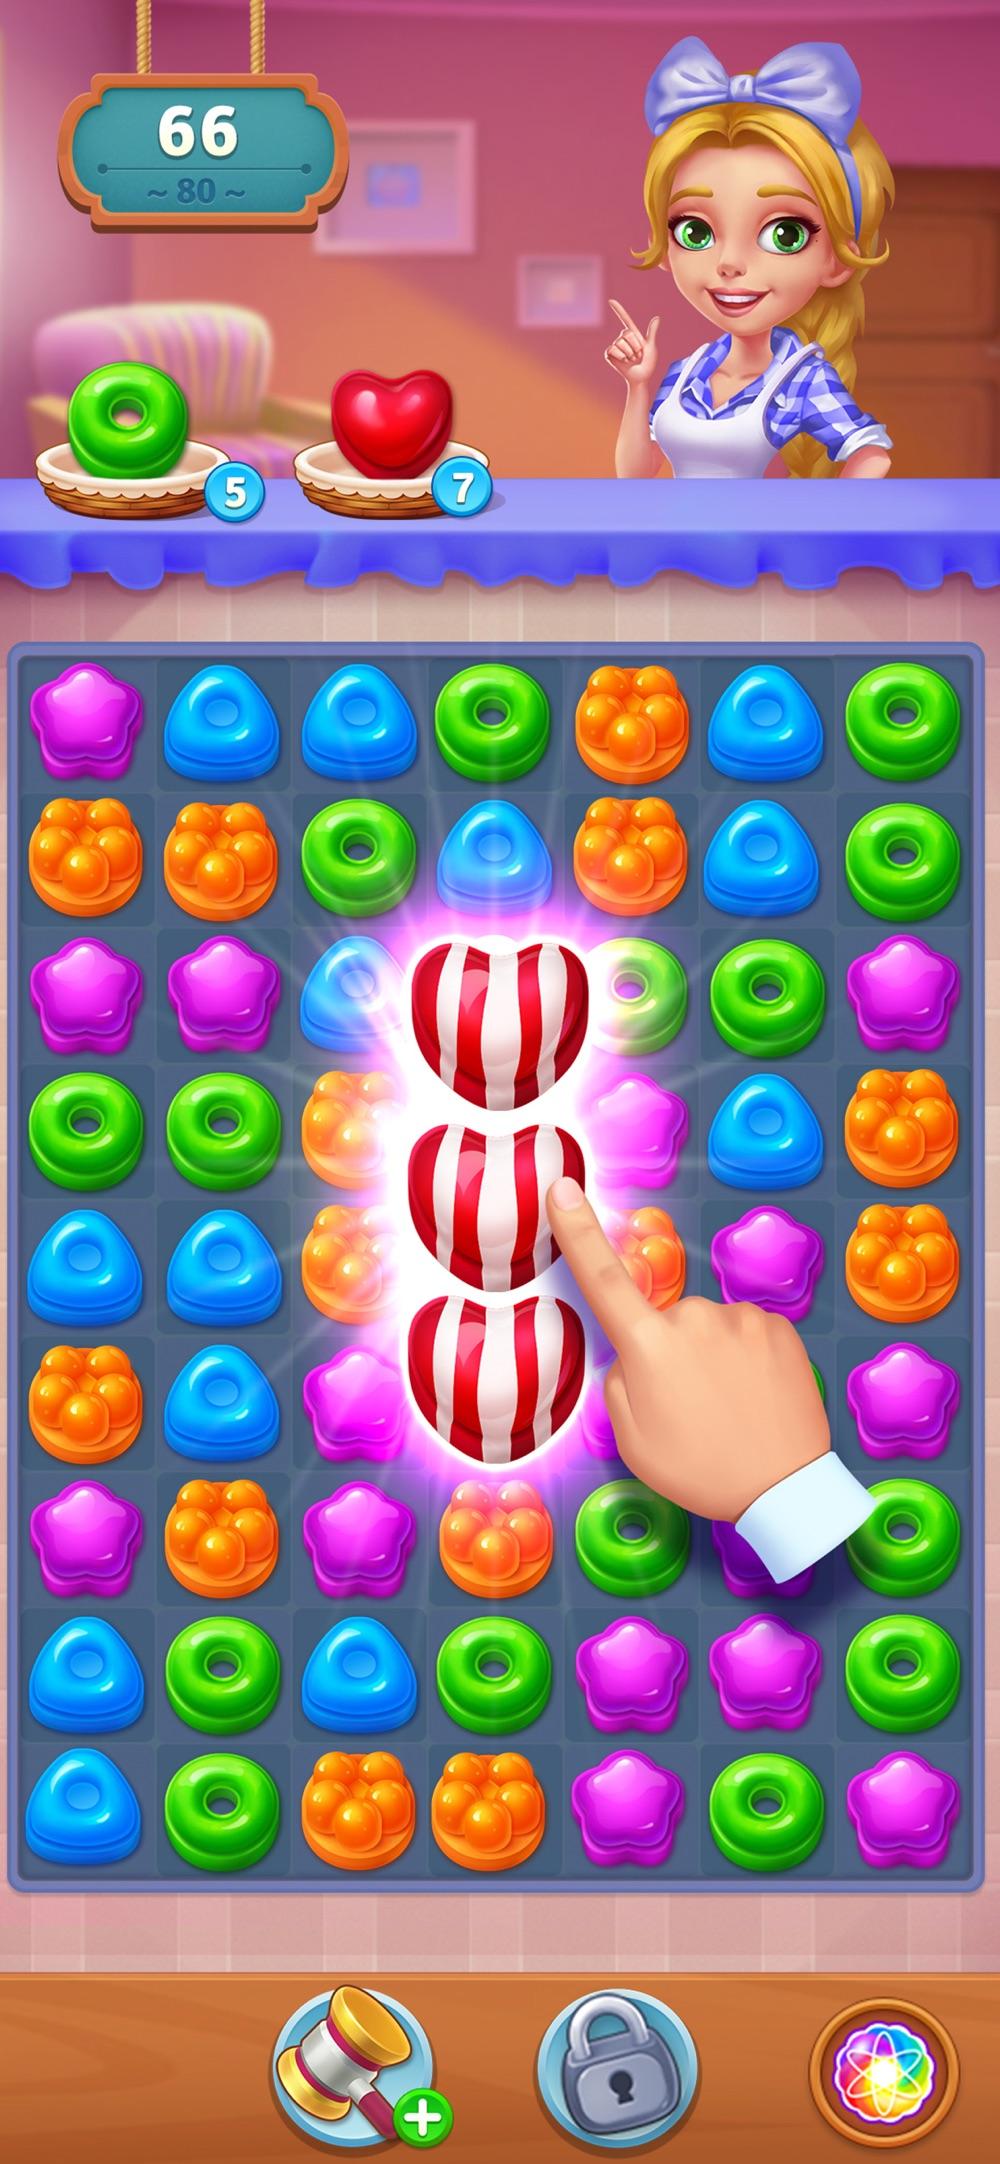 Candy Smash Mania – Match 3 Cheat Codes